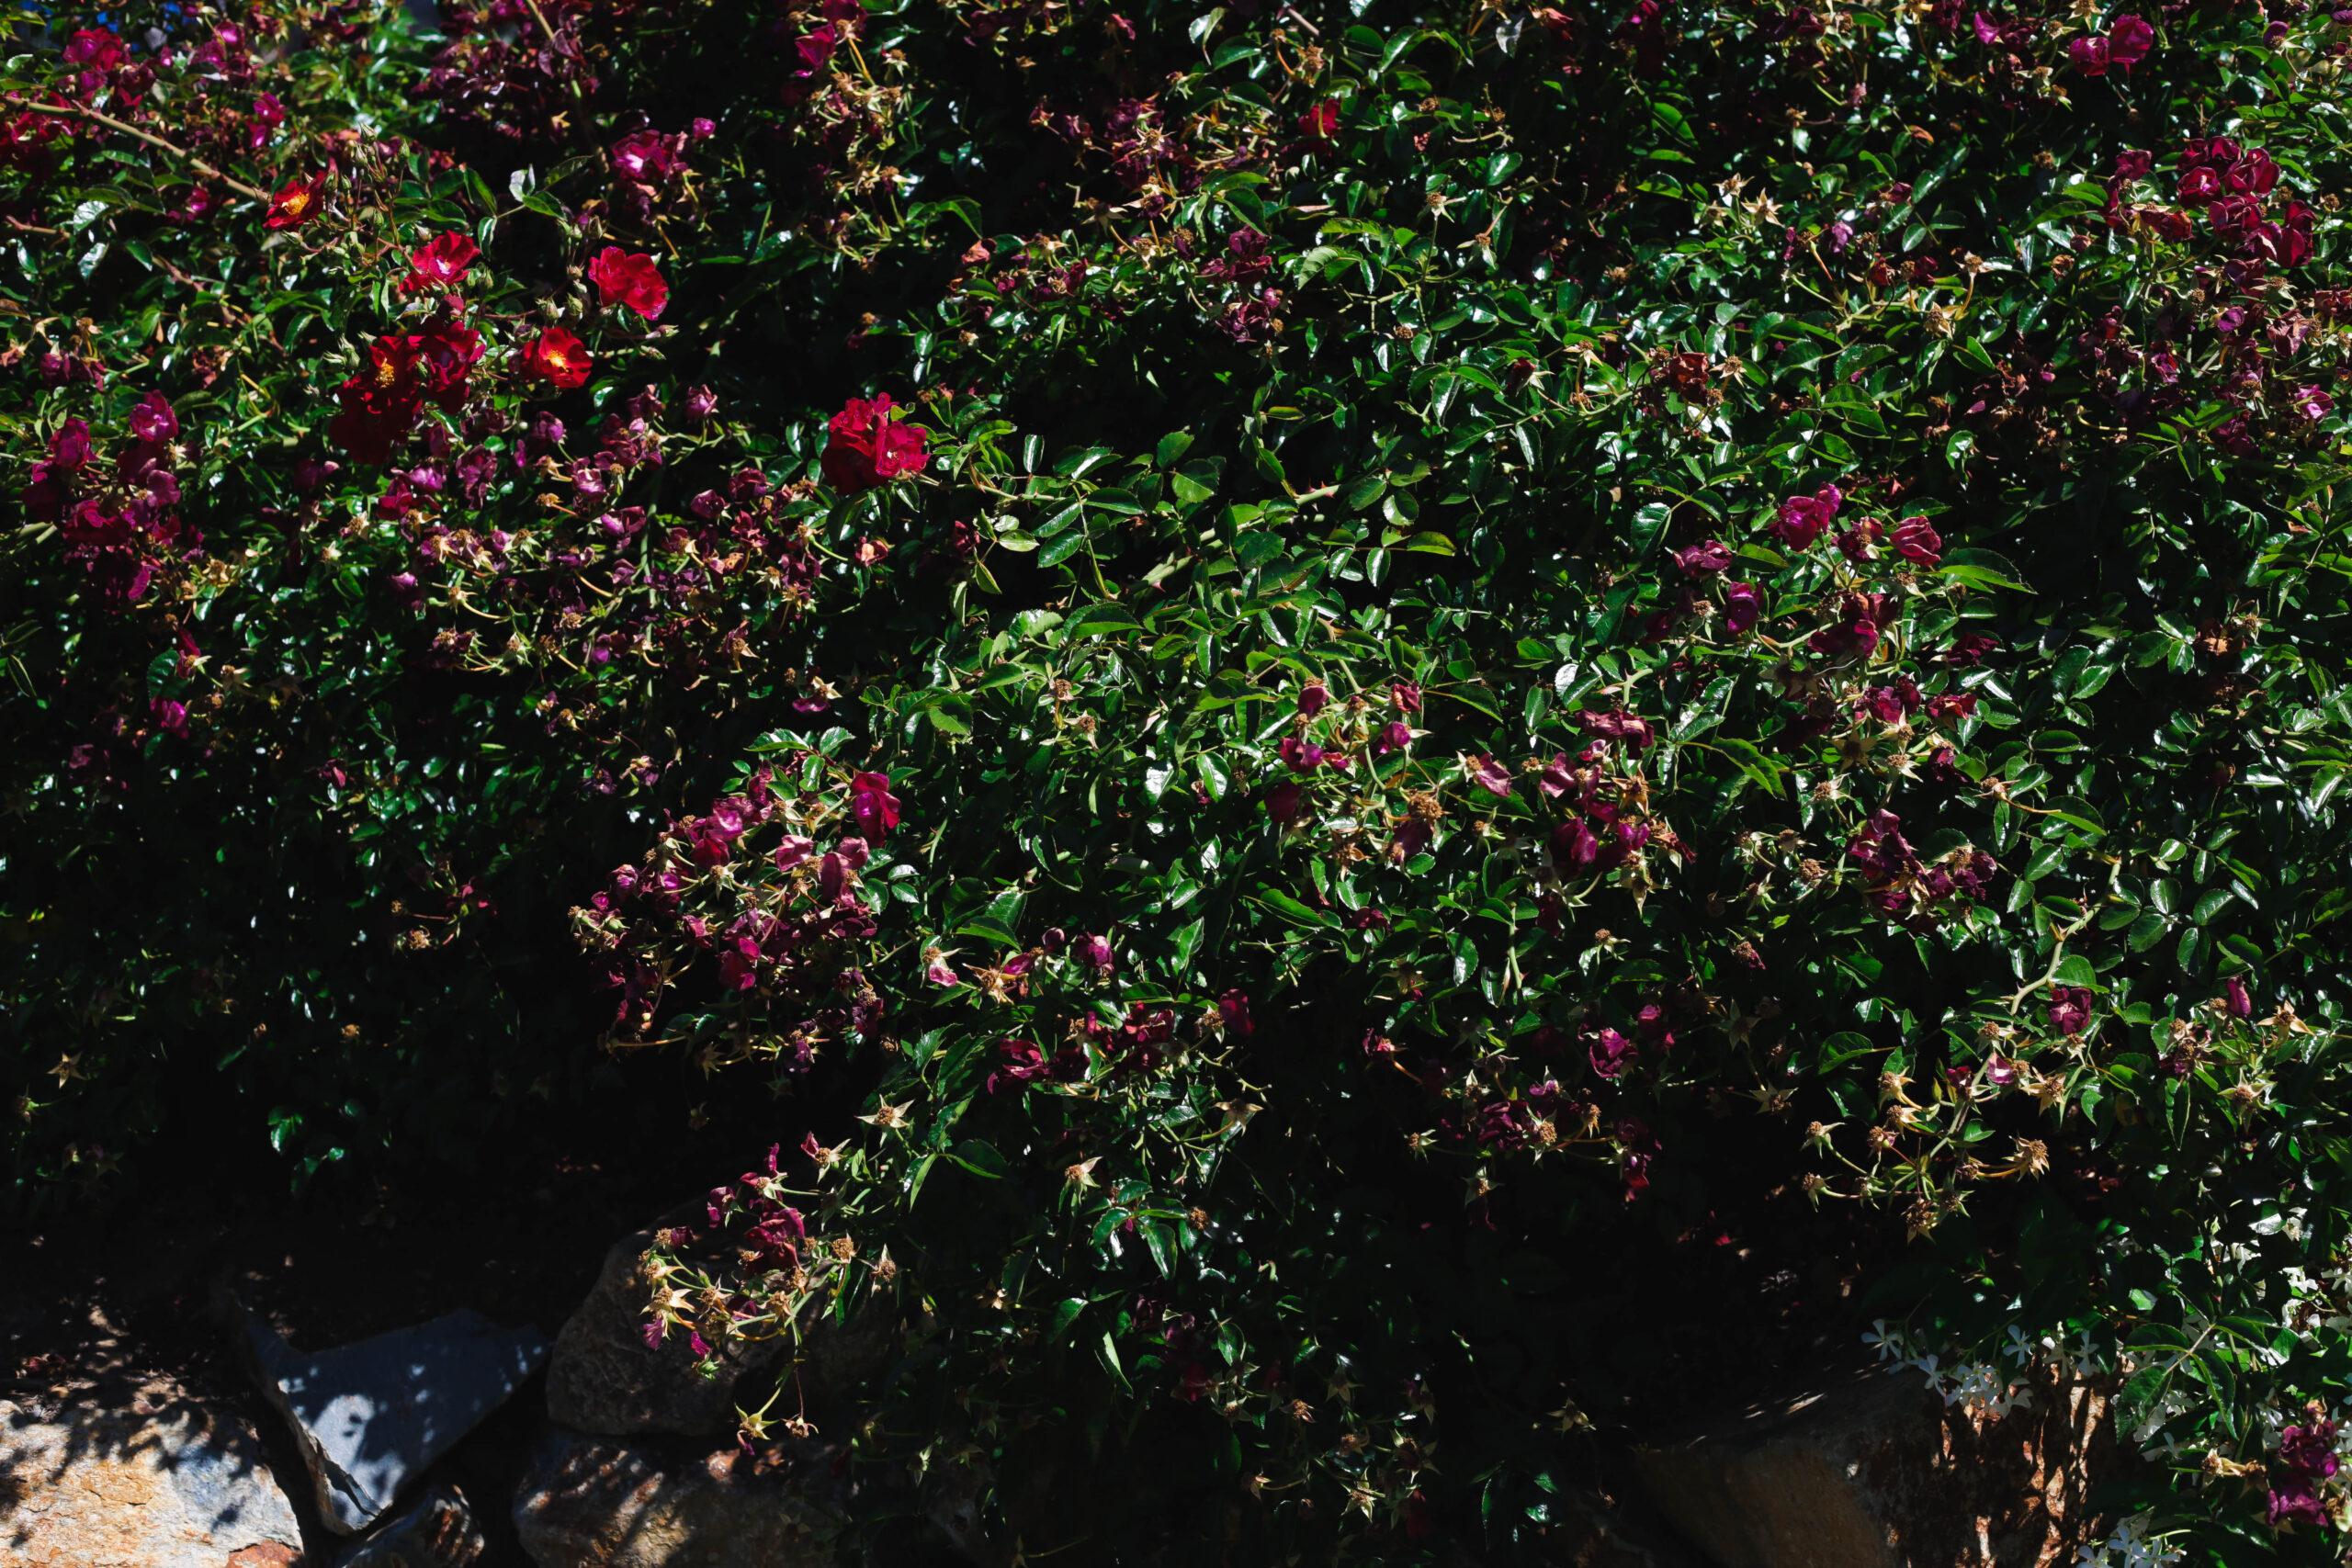 this image shows fair oaks california pruning